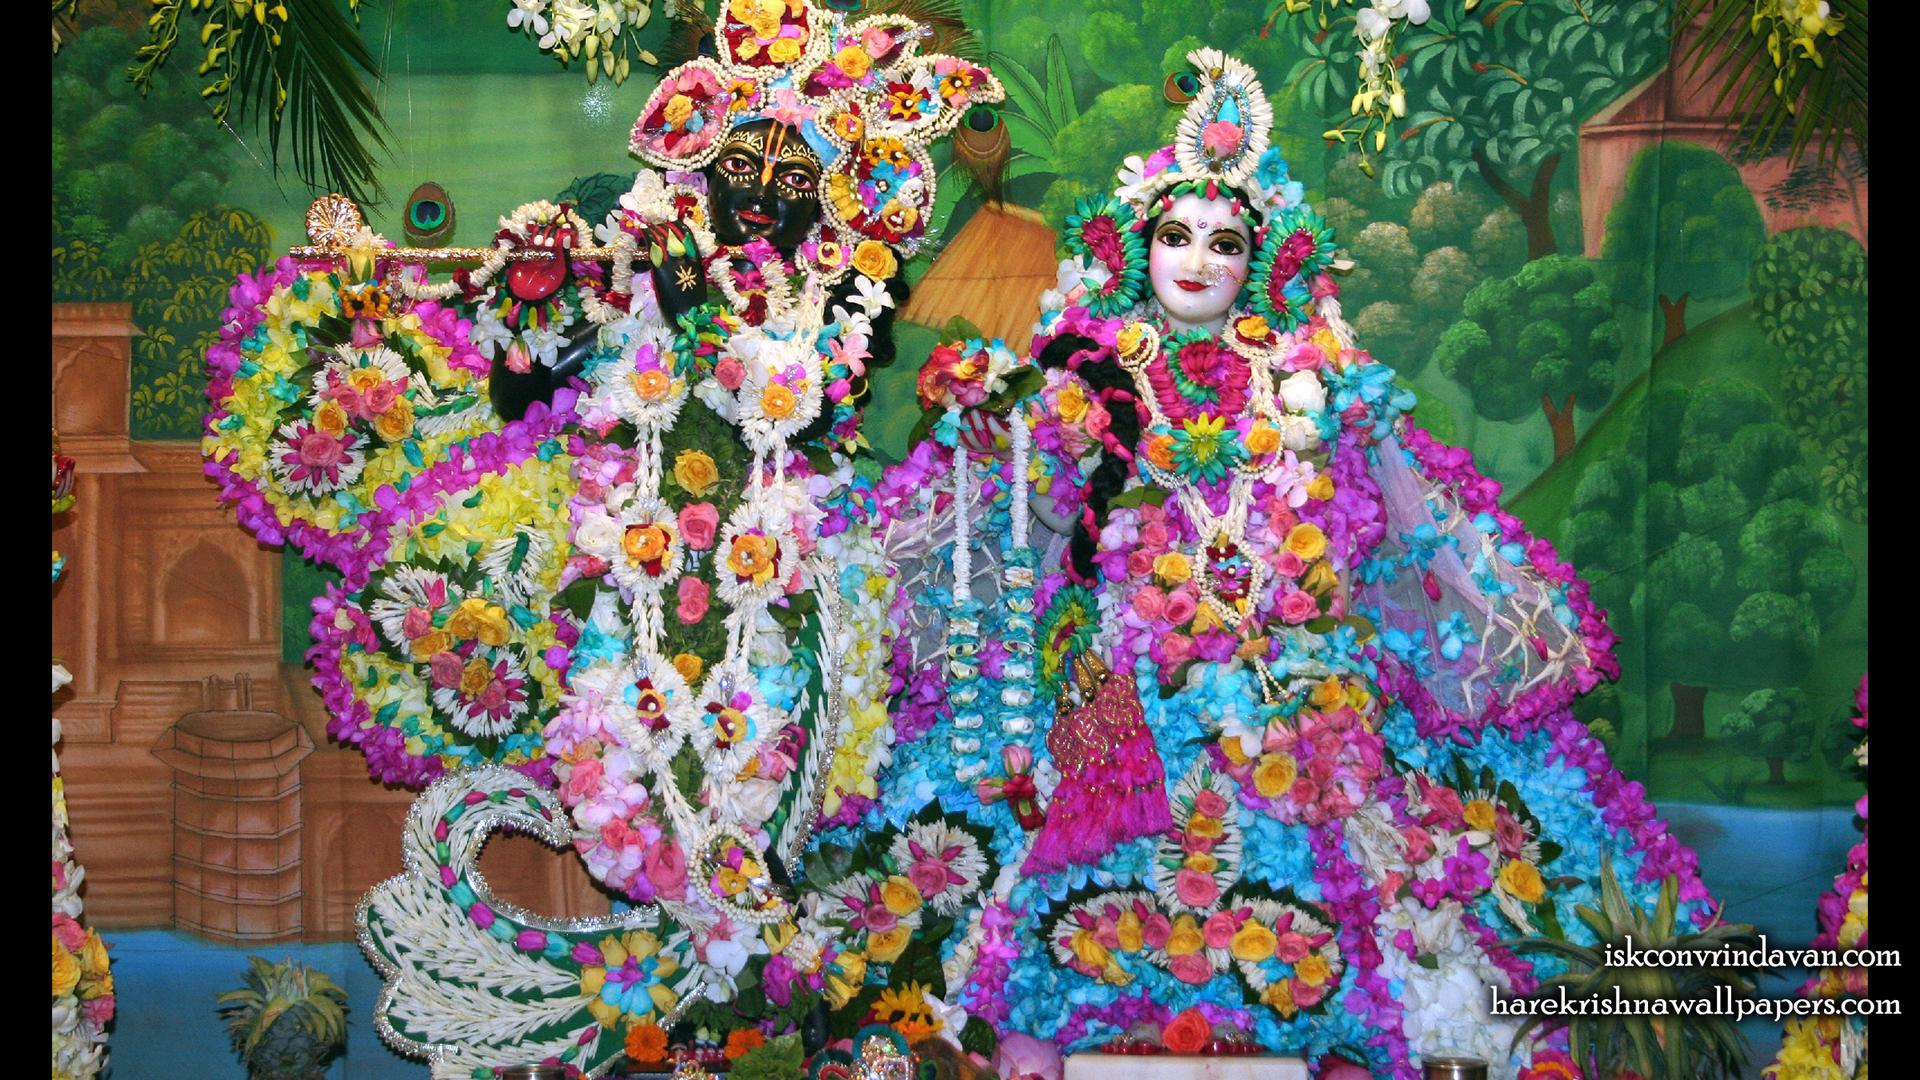 Sri Sri Radha Shyamsundar Wallpaper (007) Size 1920x1080 Download